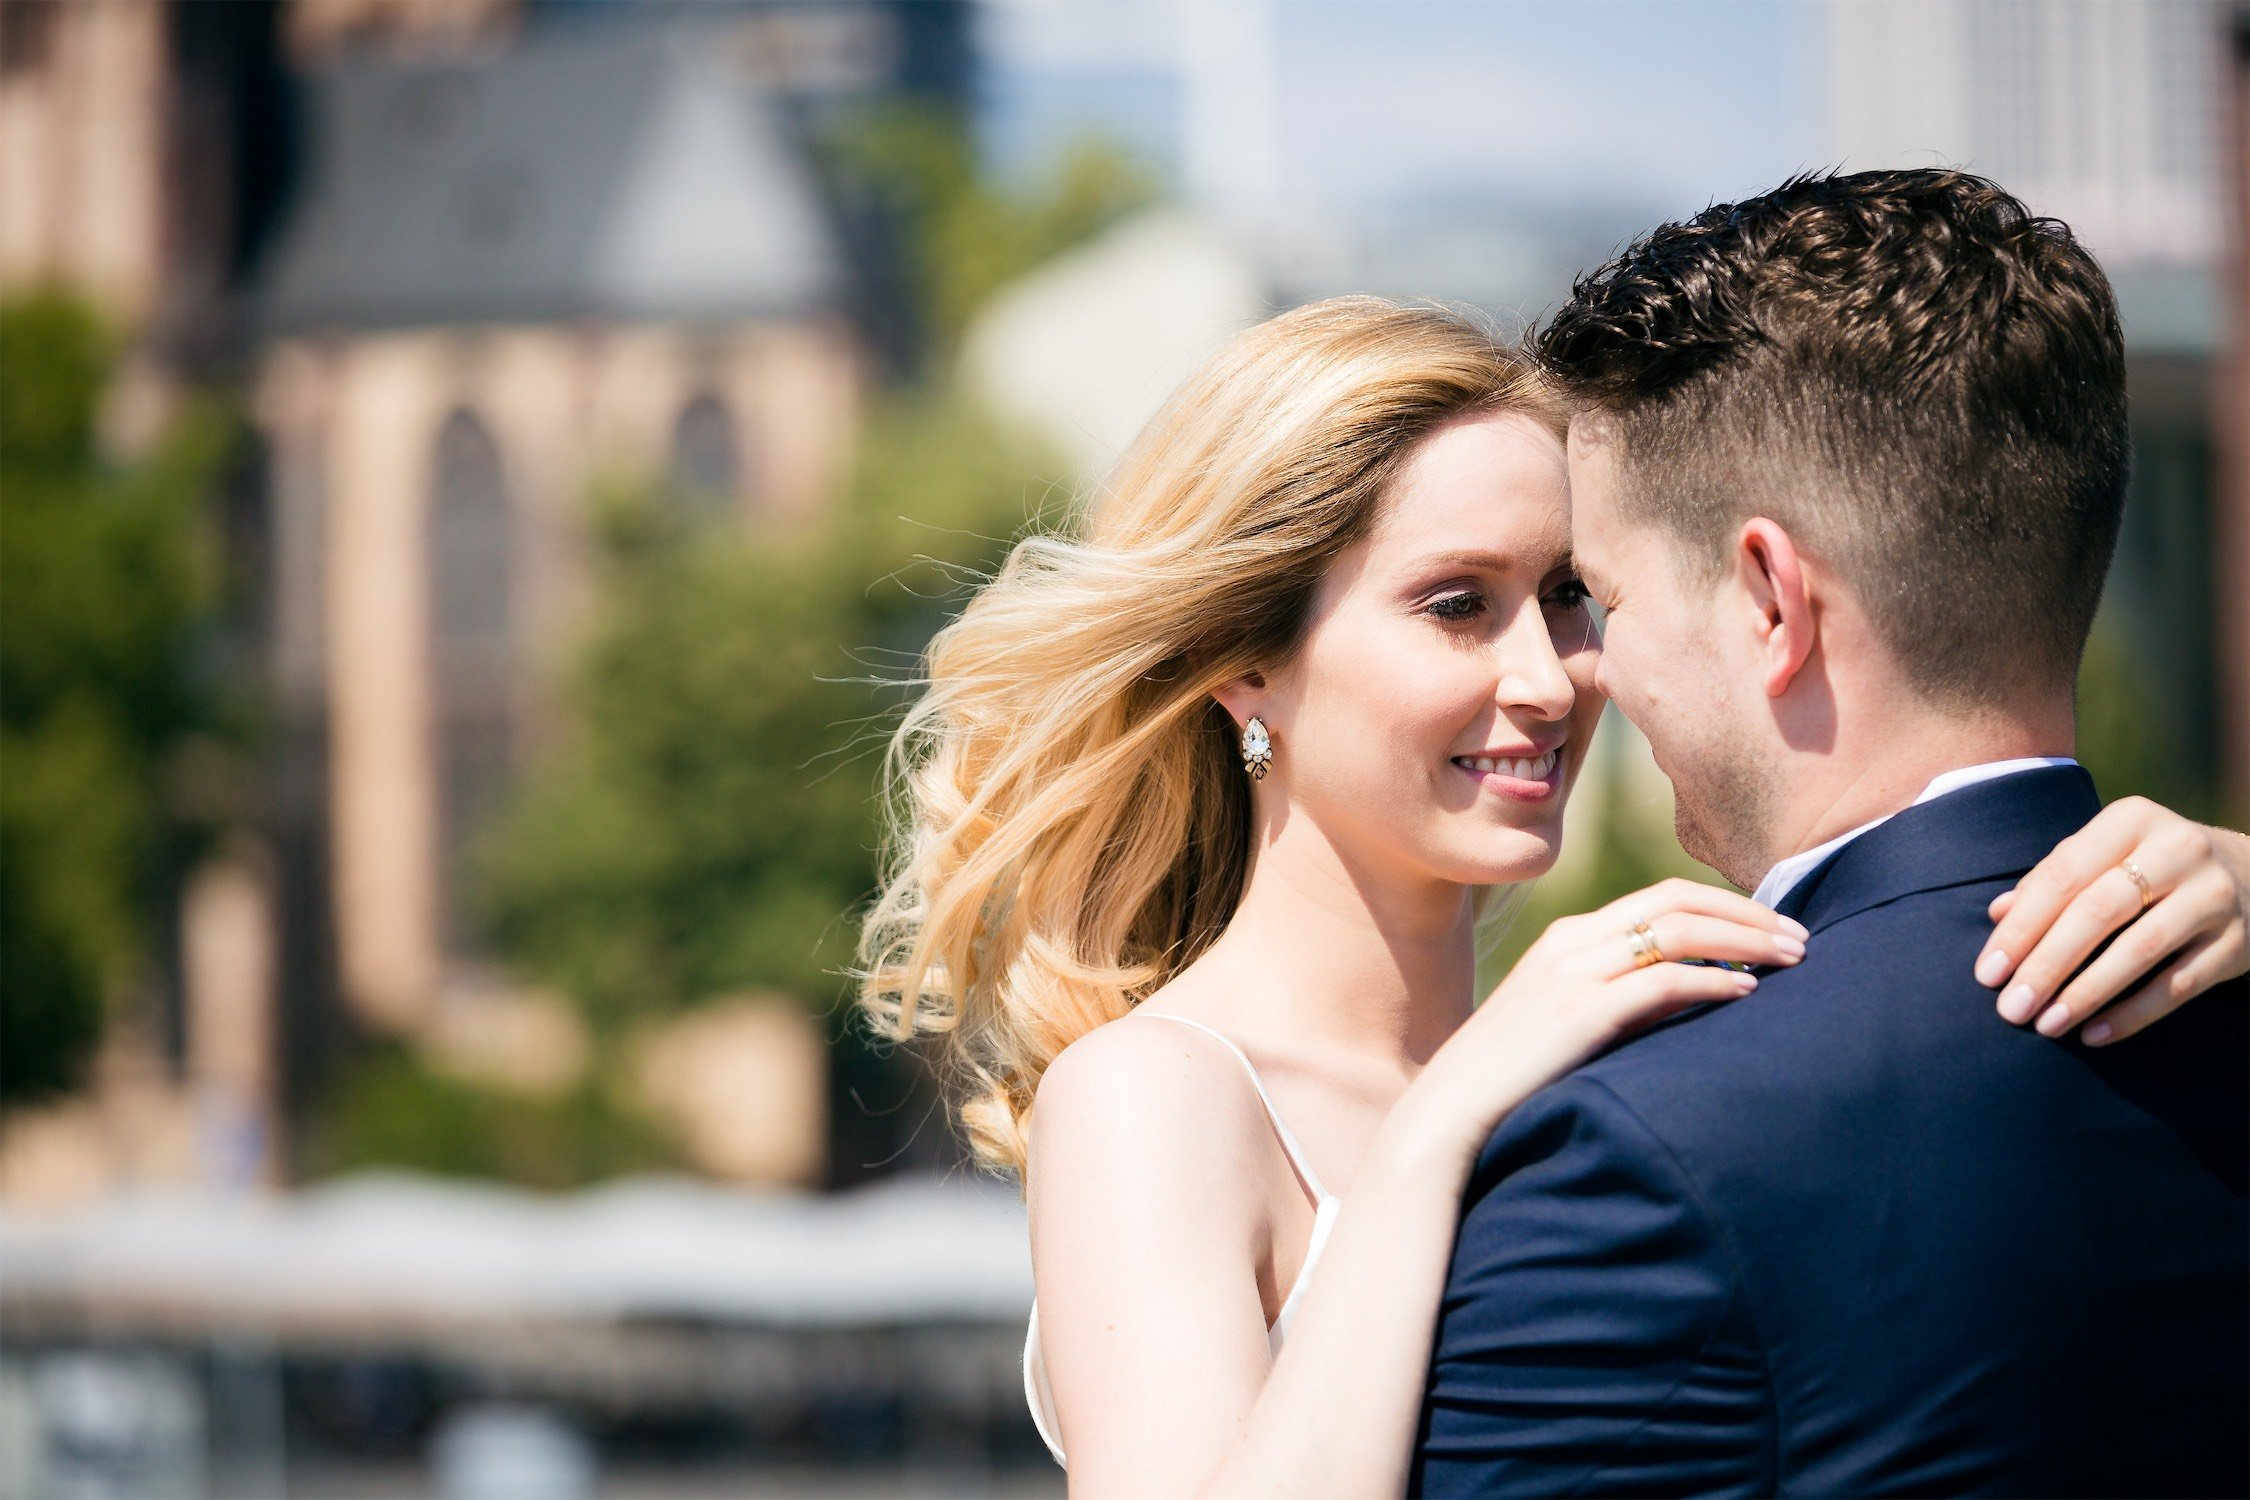 Hochzeitsfotos am Eisernen Steg vor der Feier an Seehotel Niedernberg